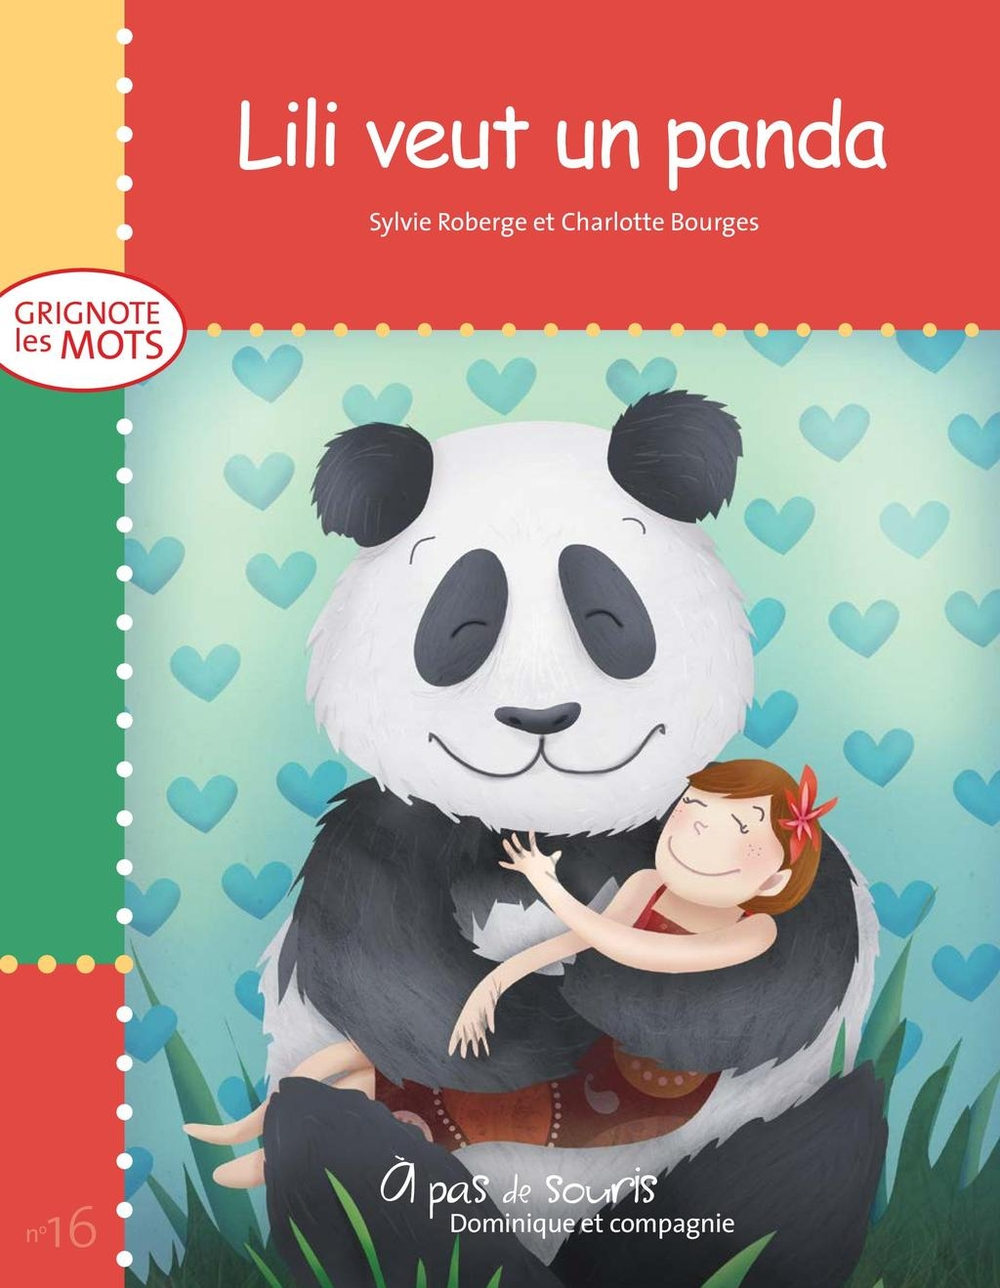 Lili veut un panda